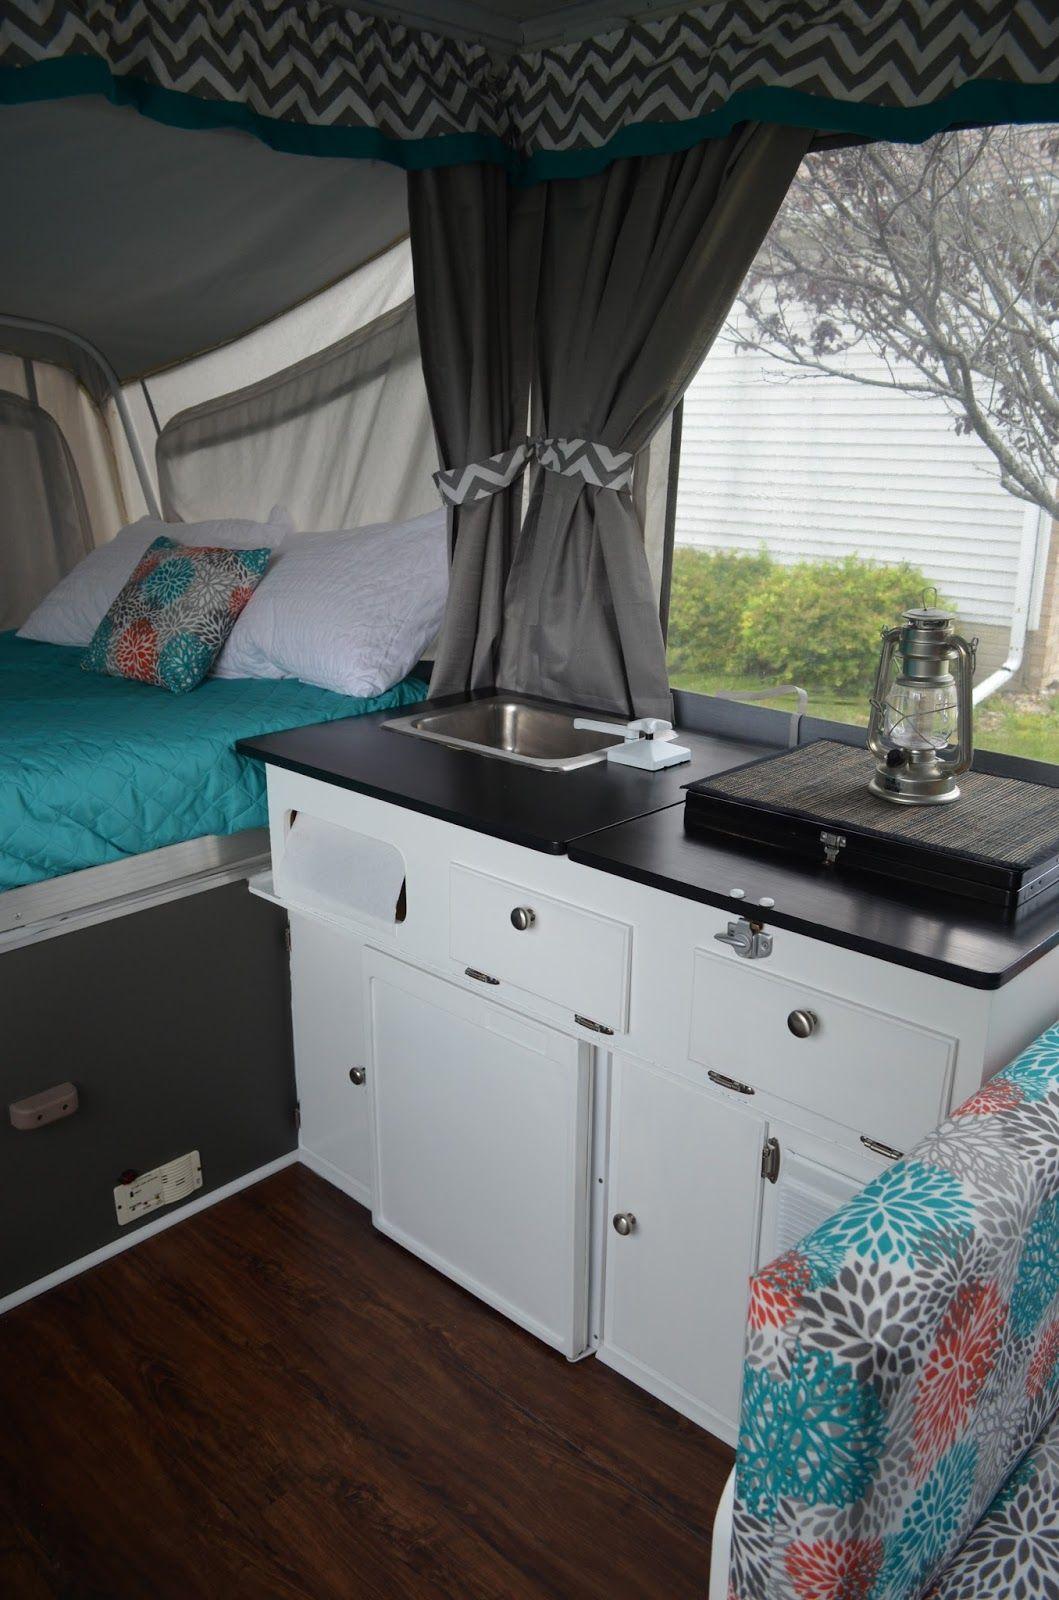 Pop Up Camper Remodel Ideas You Can Get Additional Details At